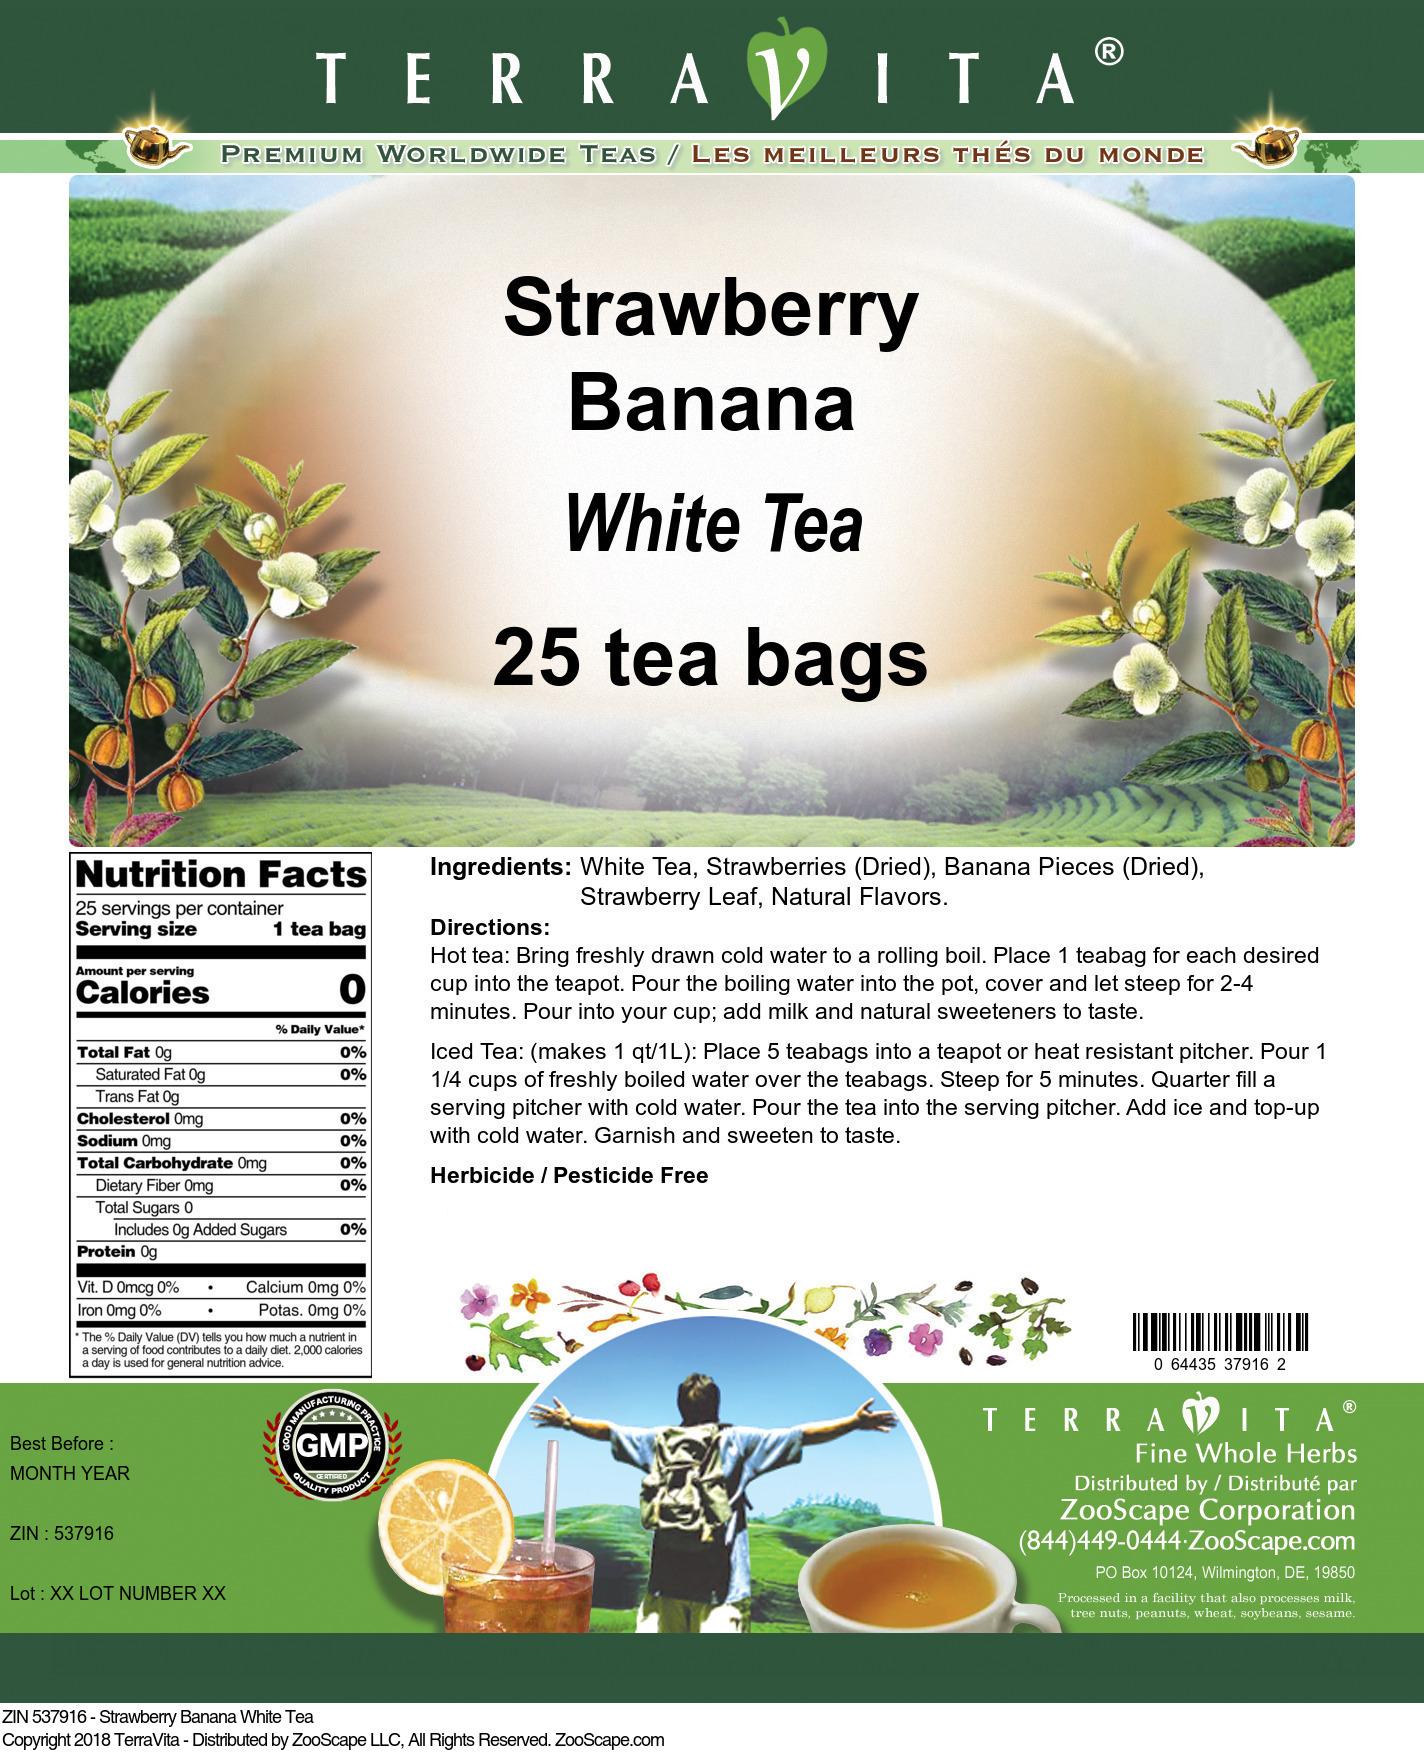 Strawberry Banana White Tea